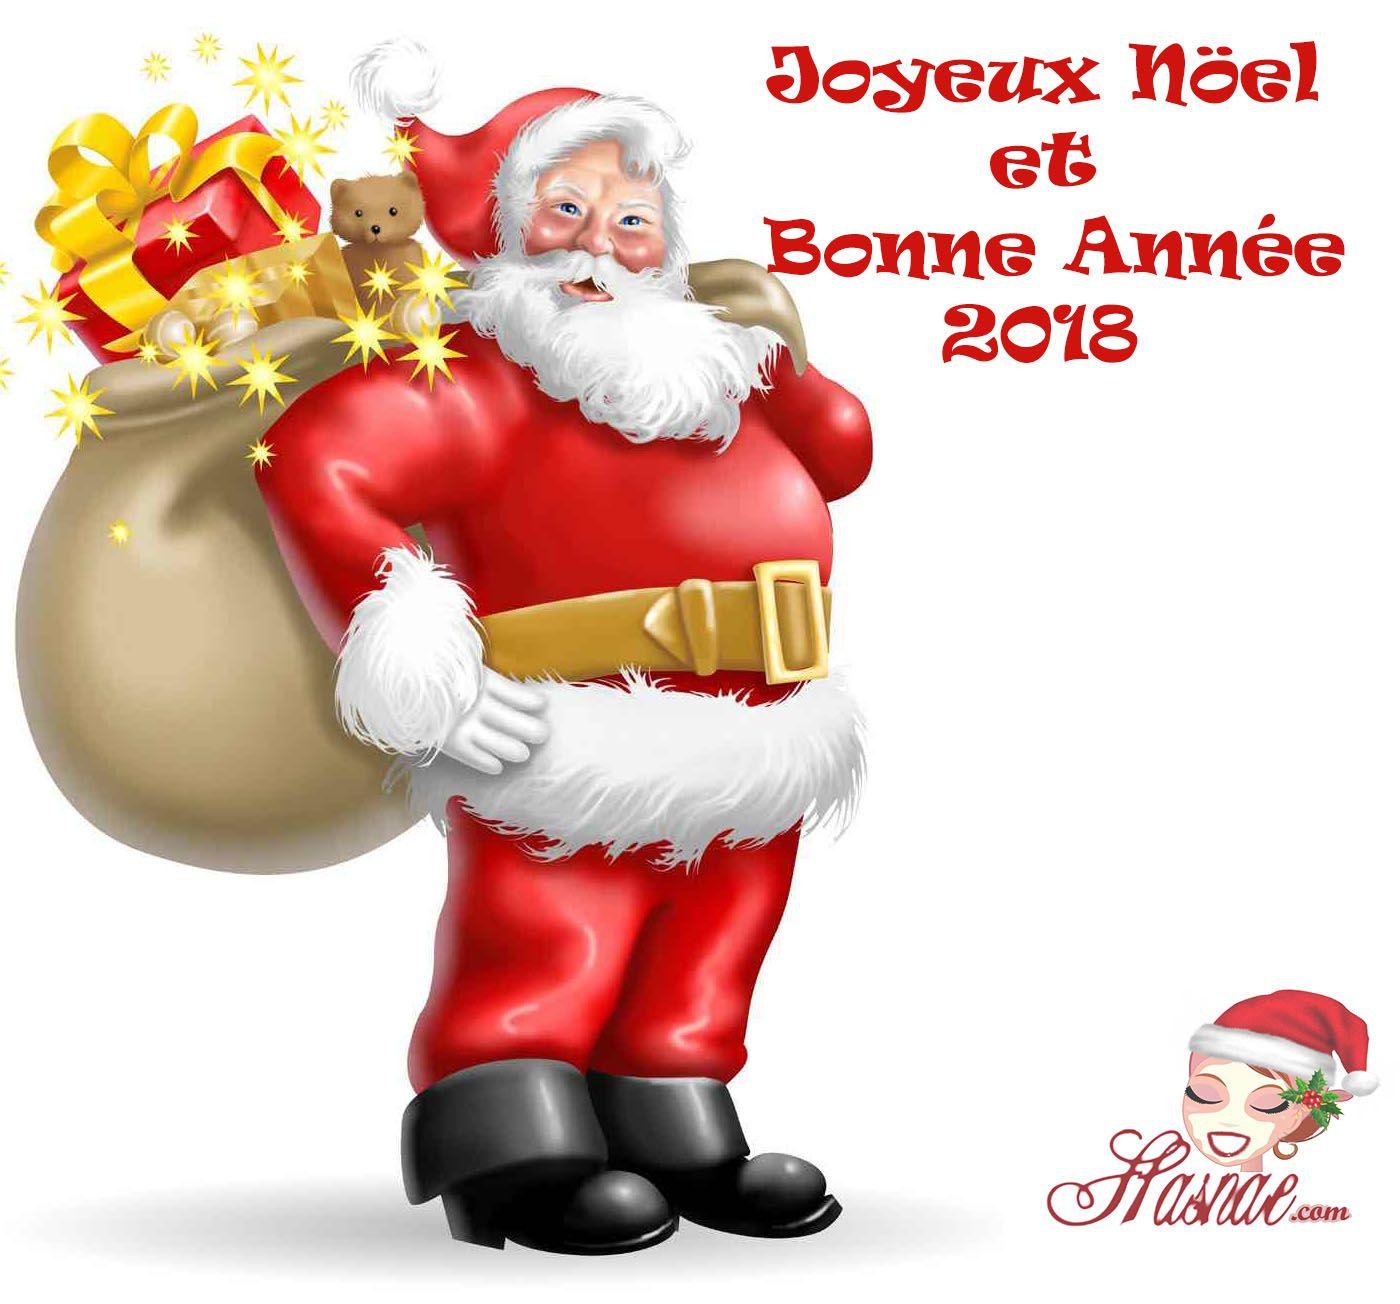 Belles photos New Year 2018 New year 2018, Ronald mcdonald